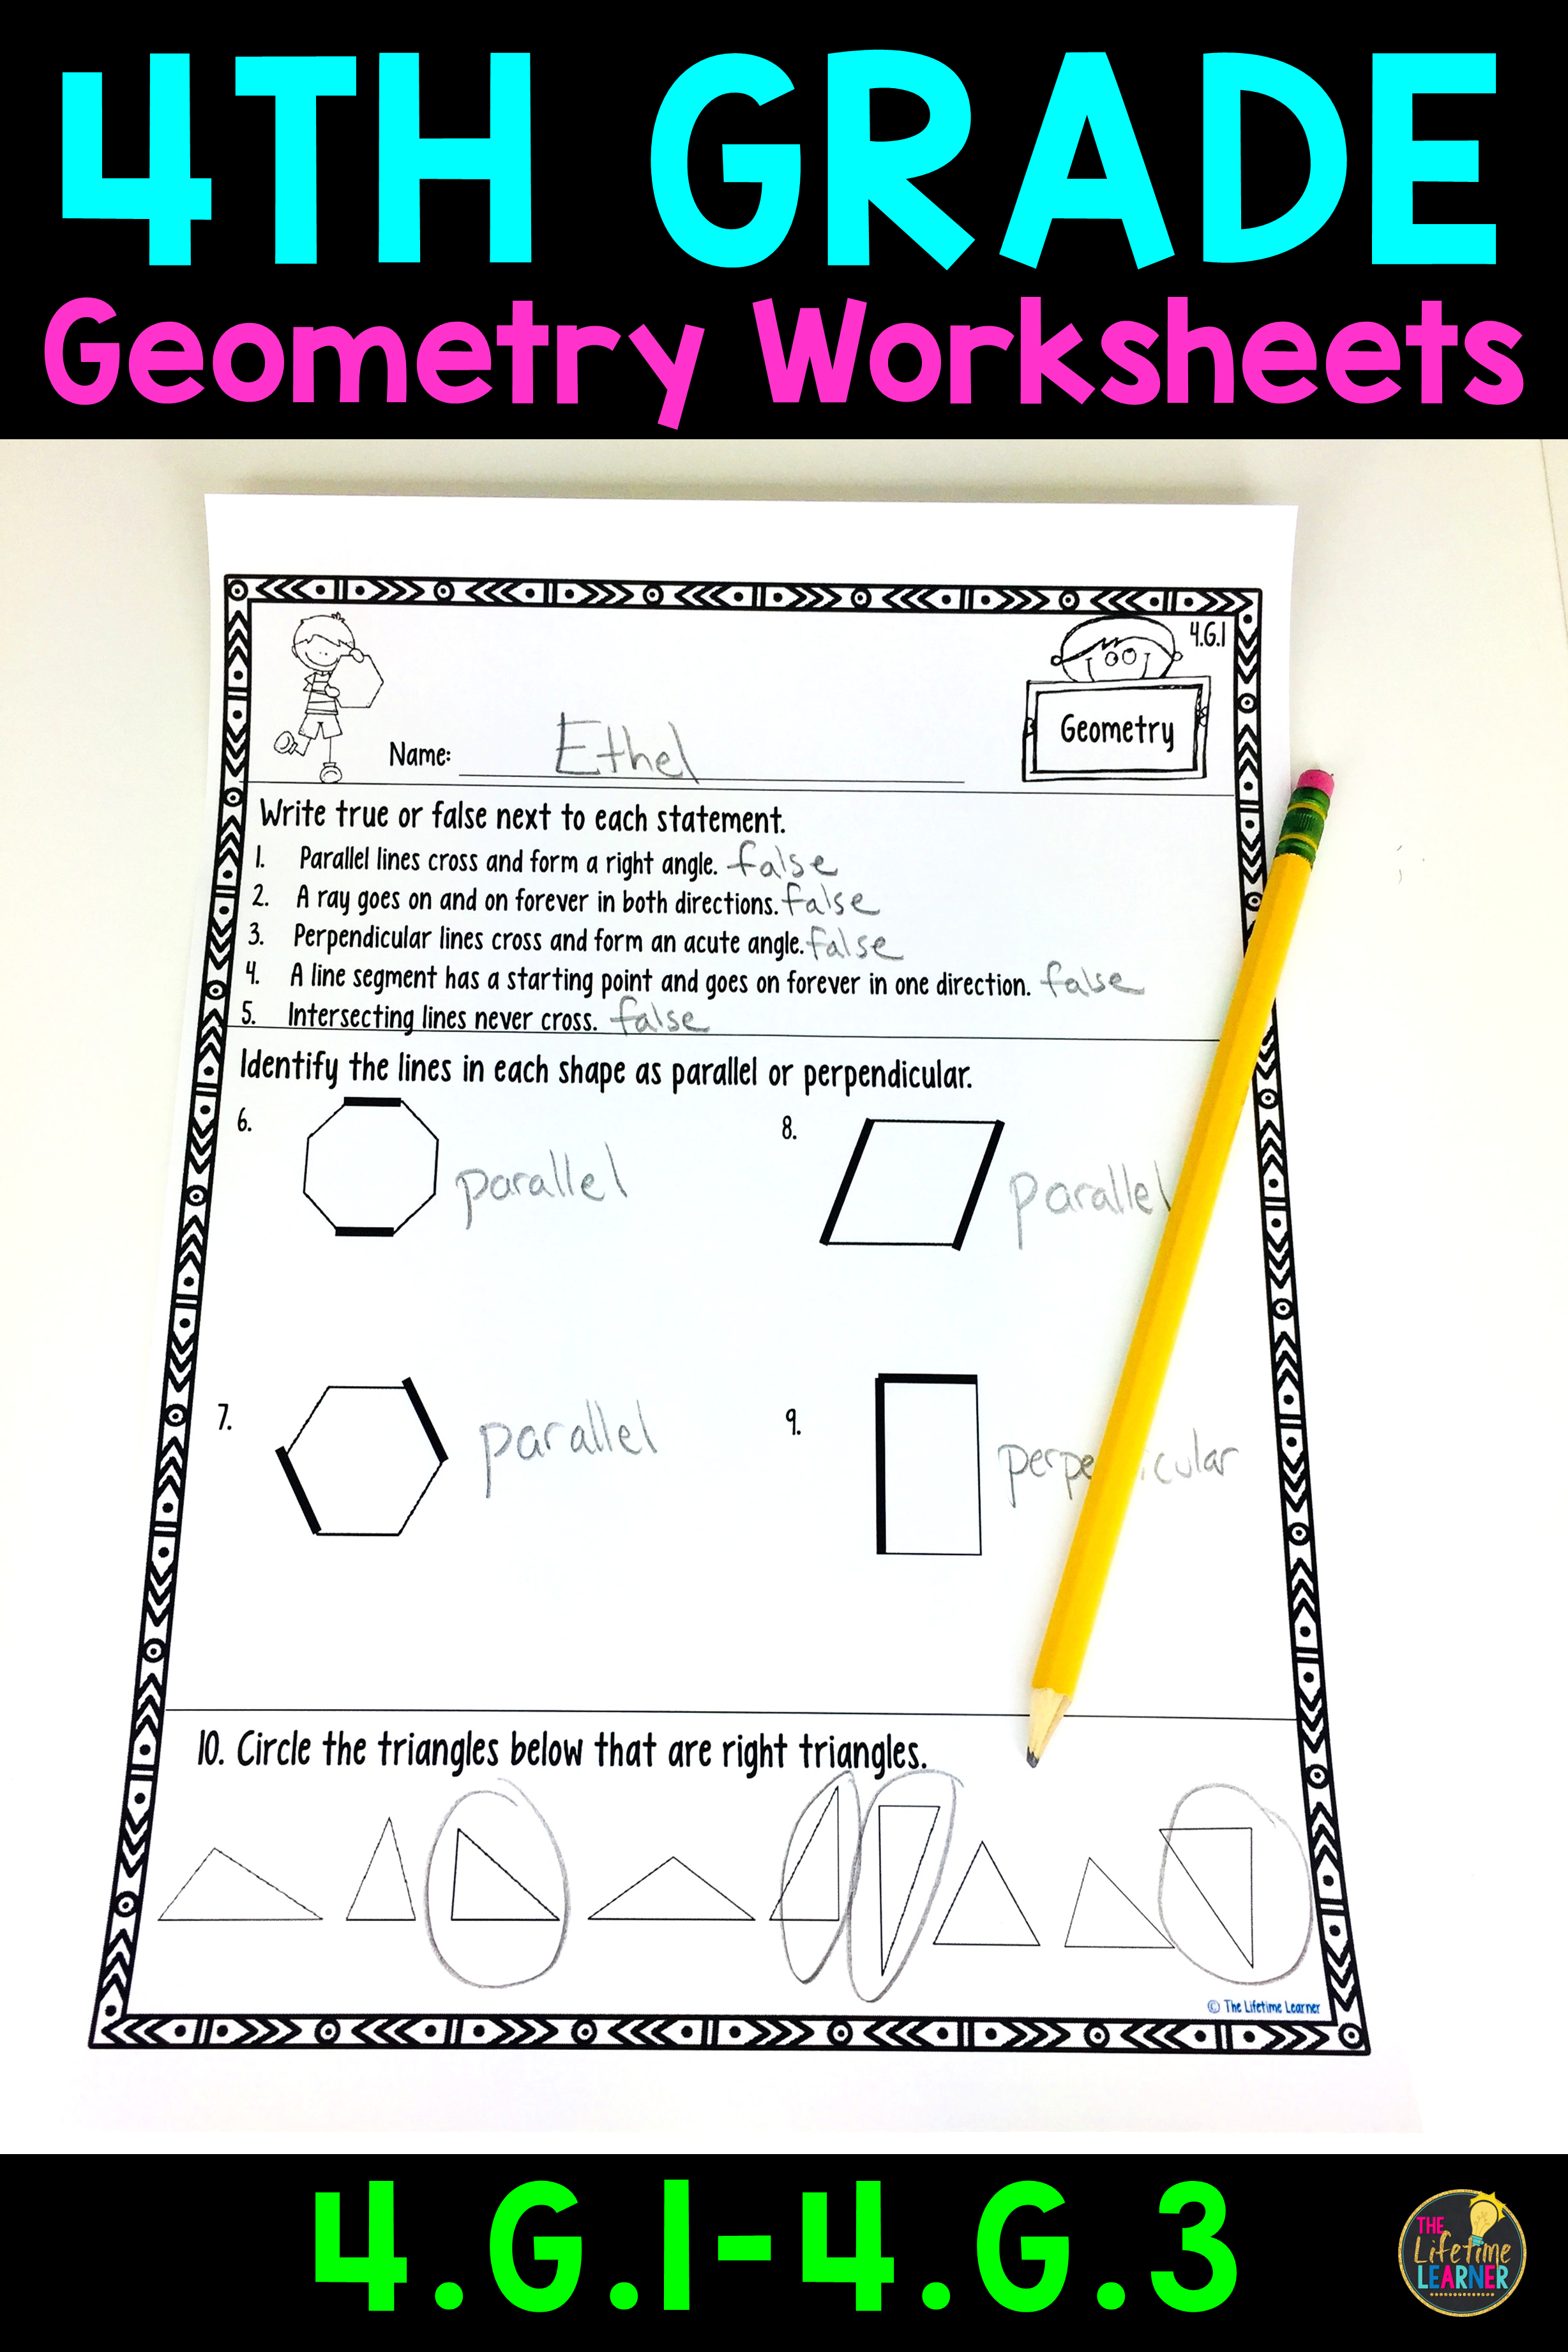 hight resolution of 4th Grade Geometry Worksheets   Geometry worksheets